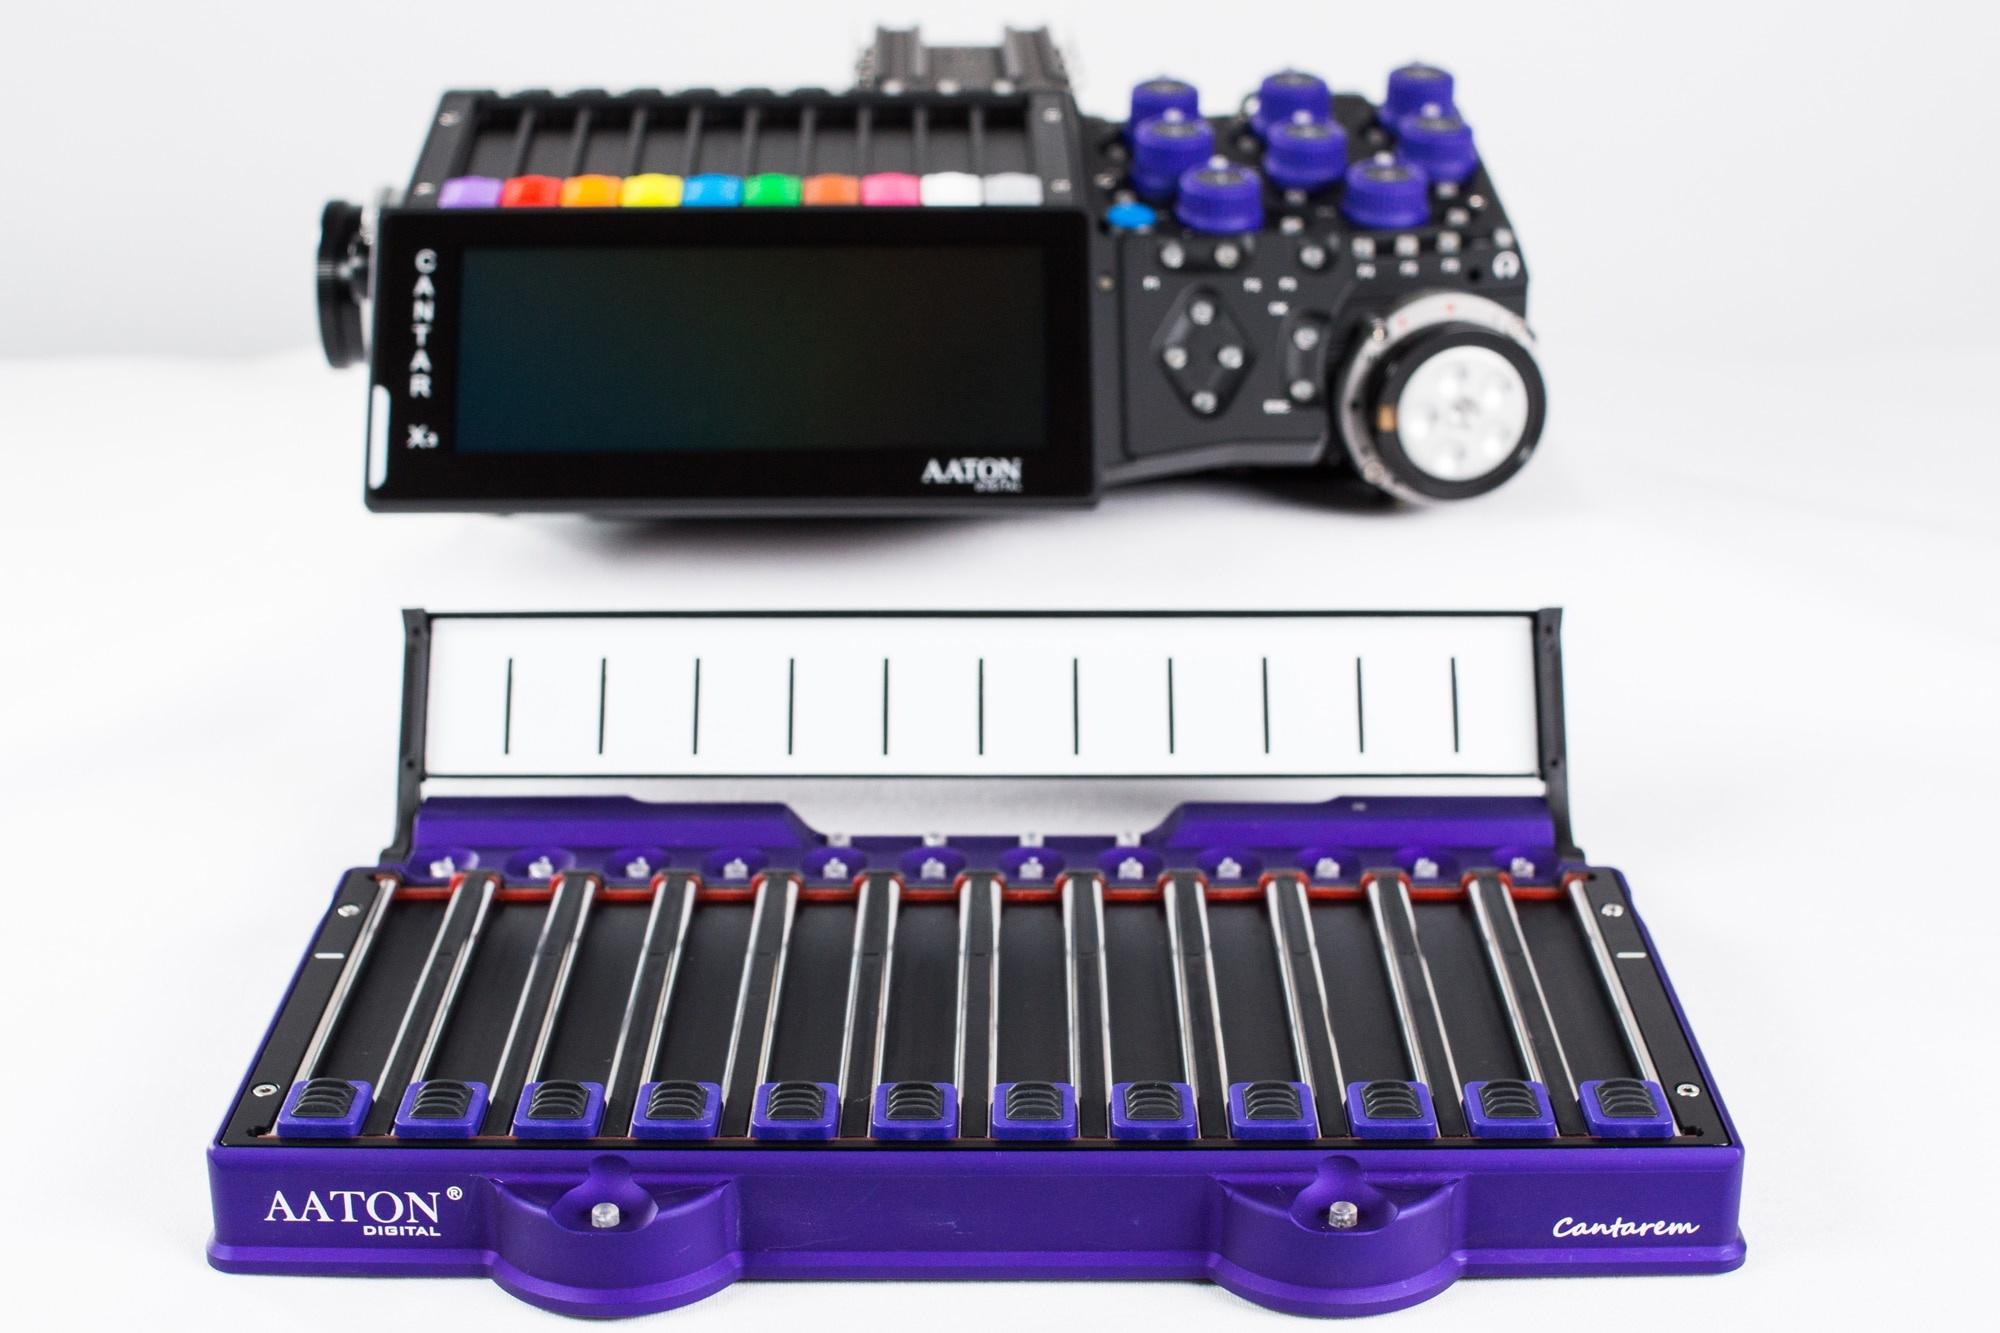 Aaton Digital Aaton Digital - Cantarem 2 - Mix-Controller  für Cantar X3 und Cantar Mini